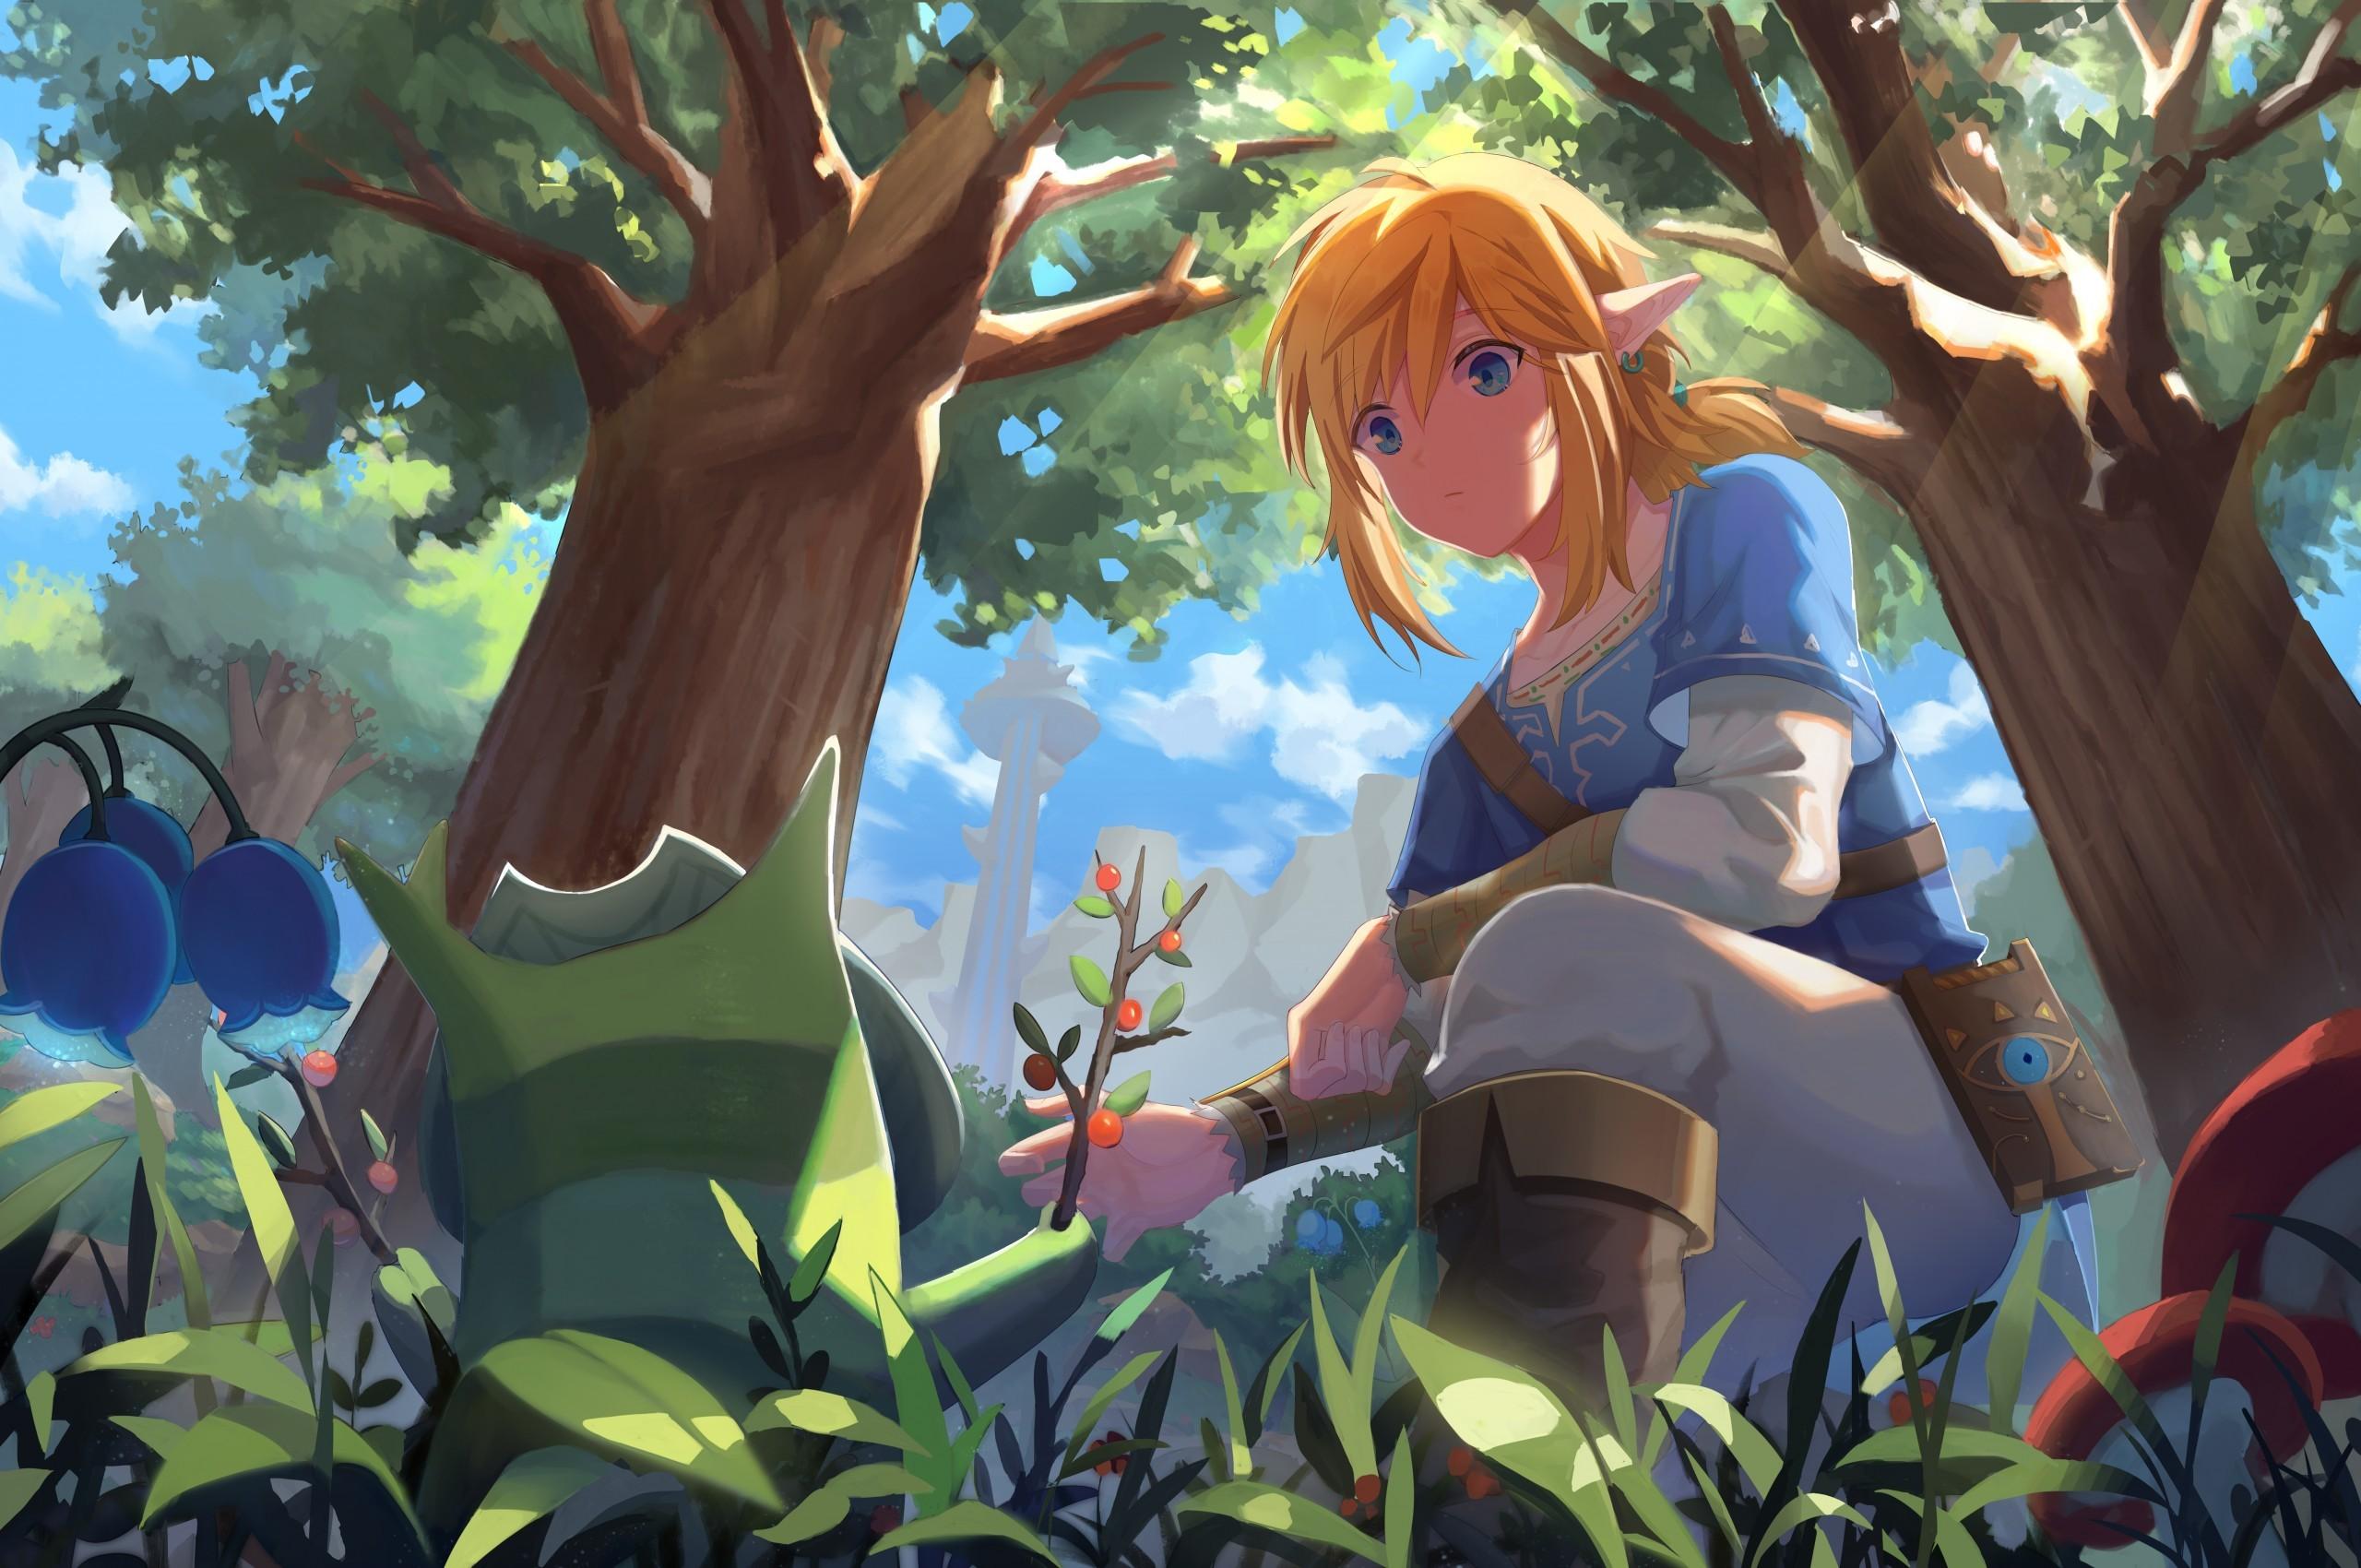 10 Best Legend Of Zelda Wind Waker Wallpaper Full Hd 1080p For Pc Background Wind Waker Legend Of Zelda Poster Prints